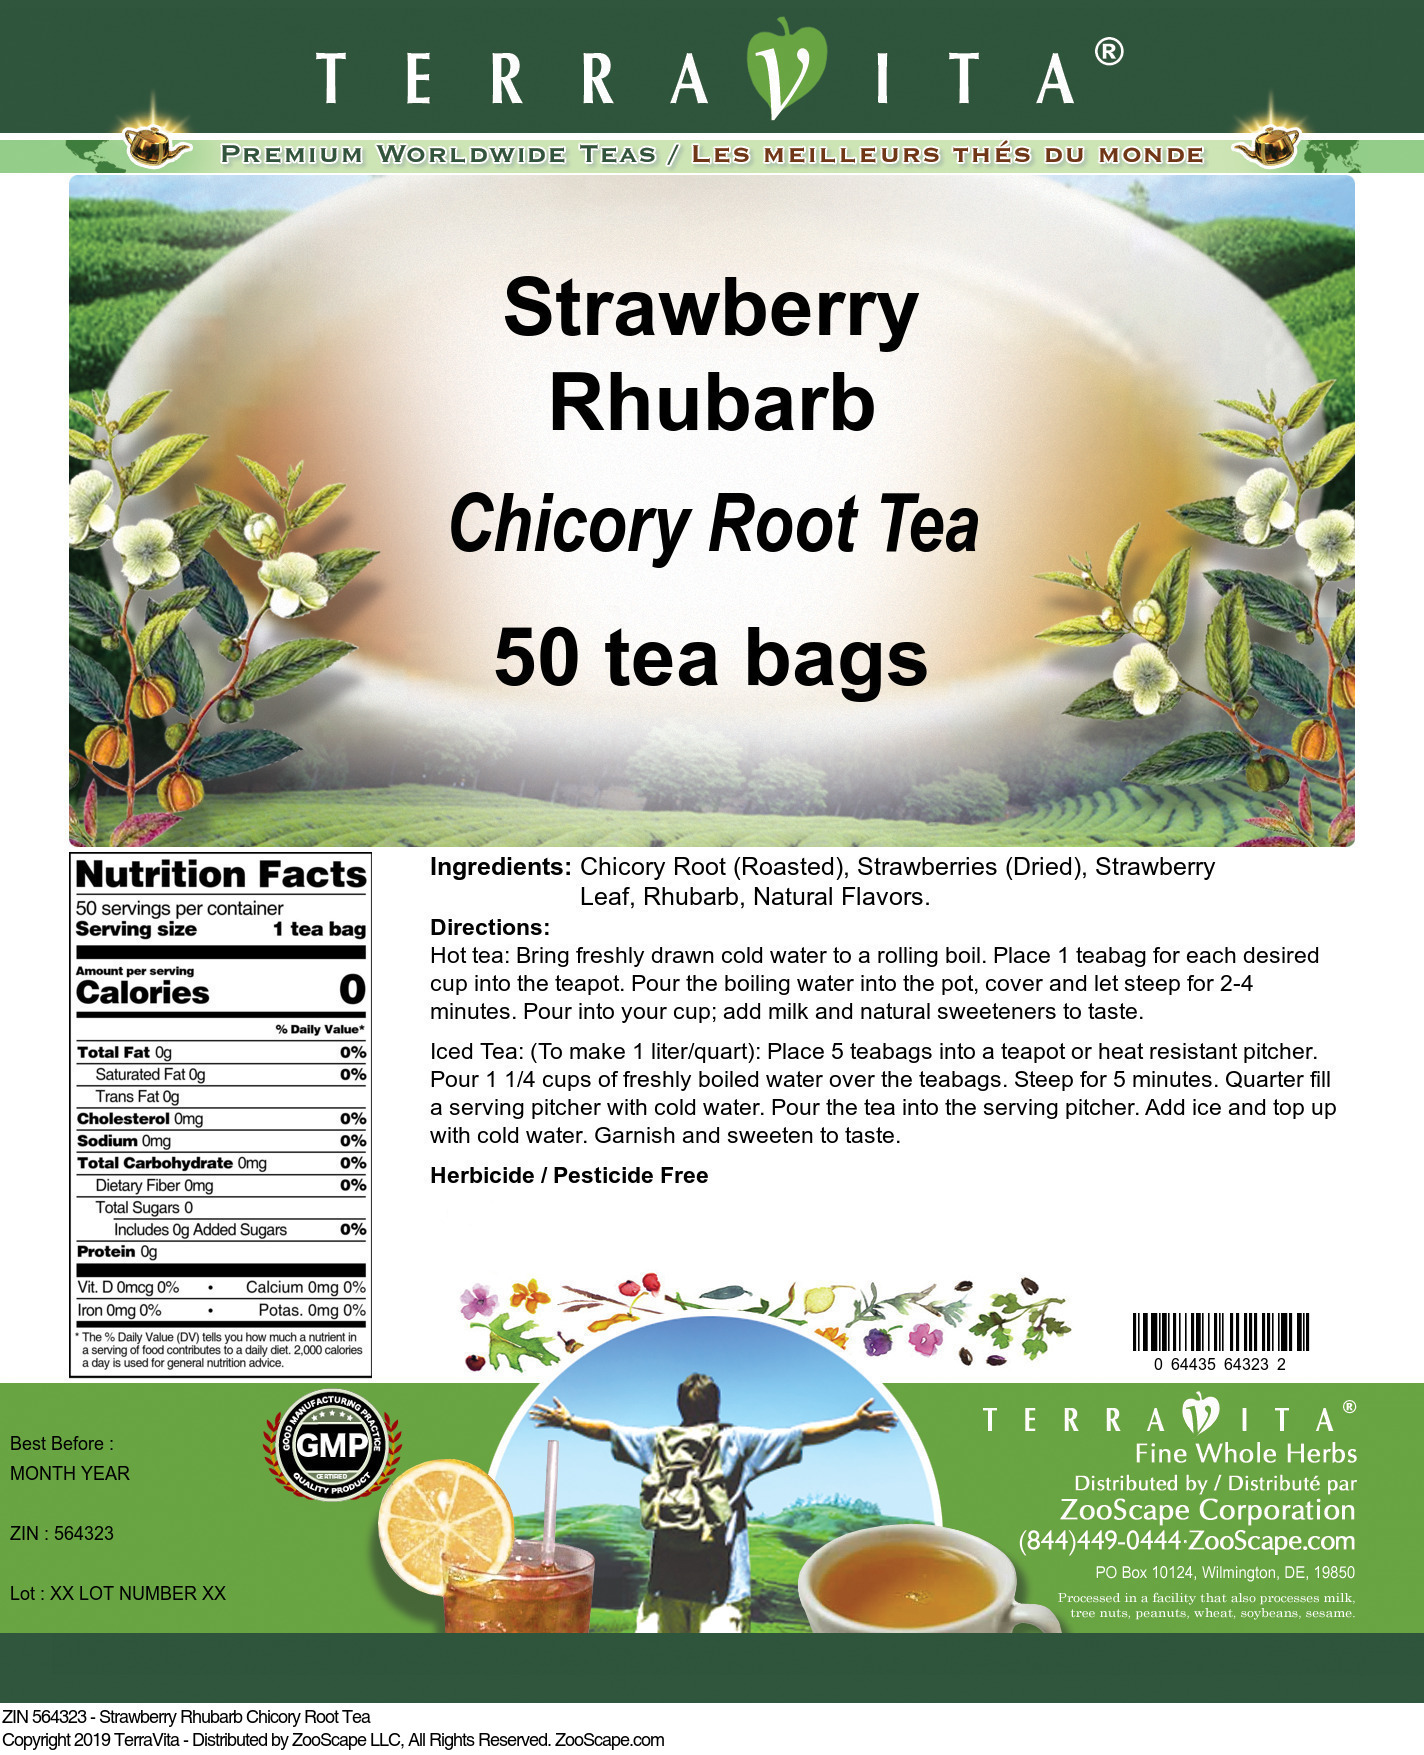 Strawberry Rhubarb Chicory Root Tea